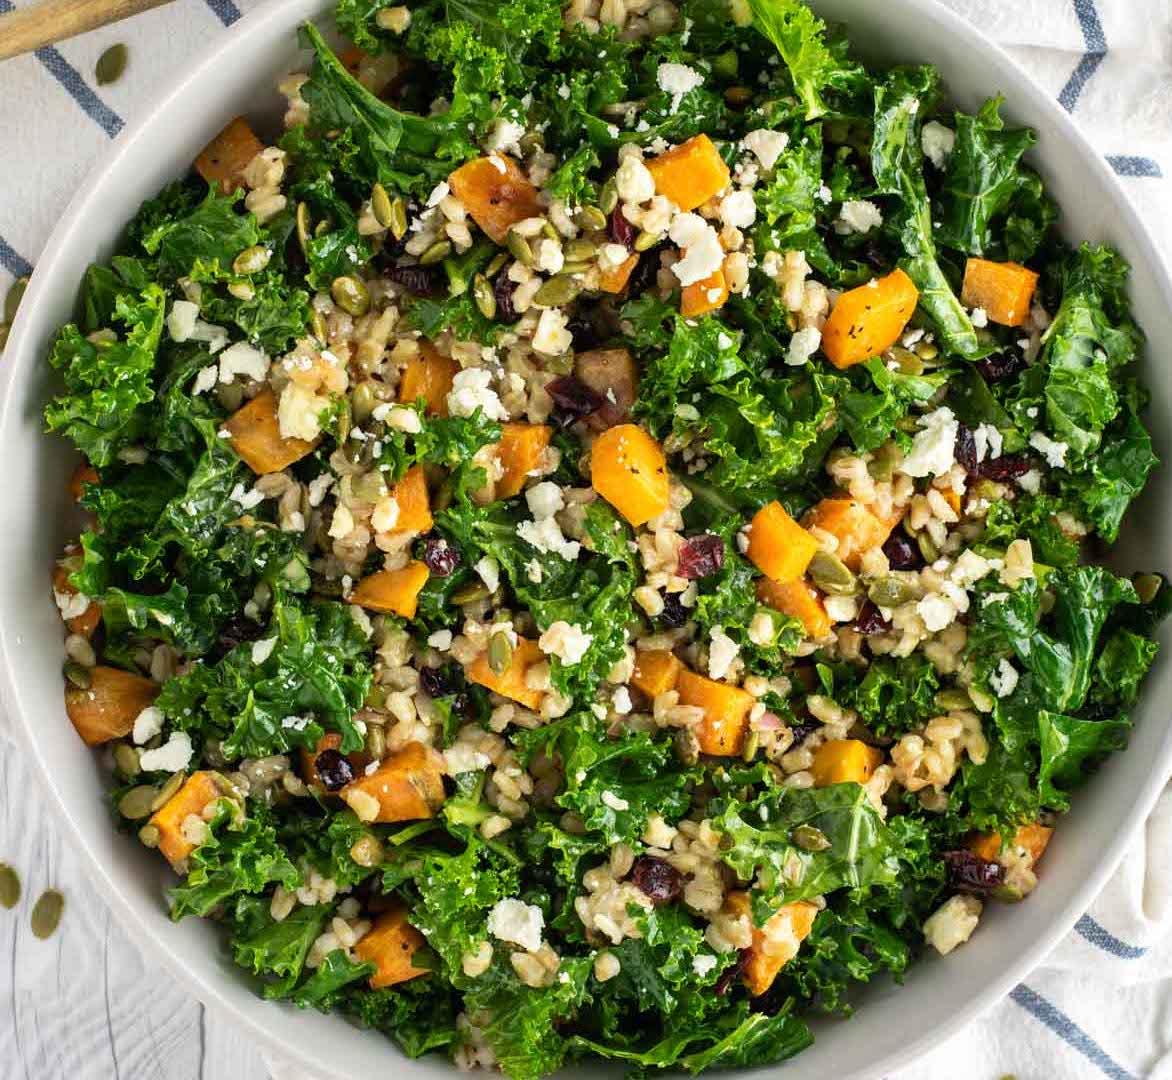 Roasted Sweet Potato, Quinoa & Kale Salad